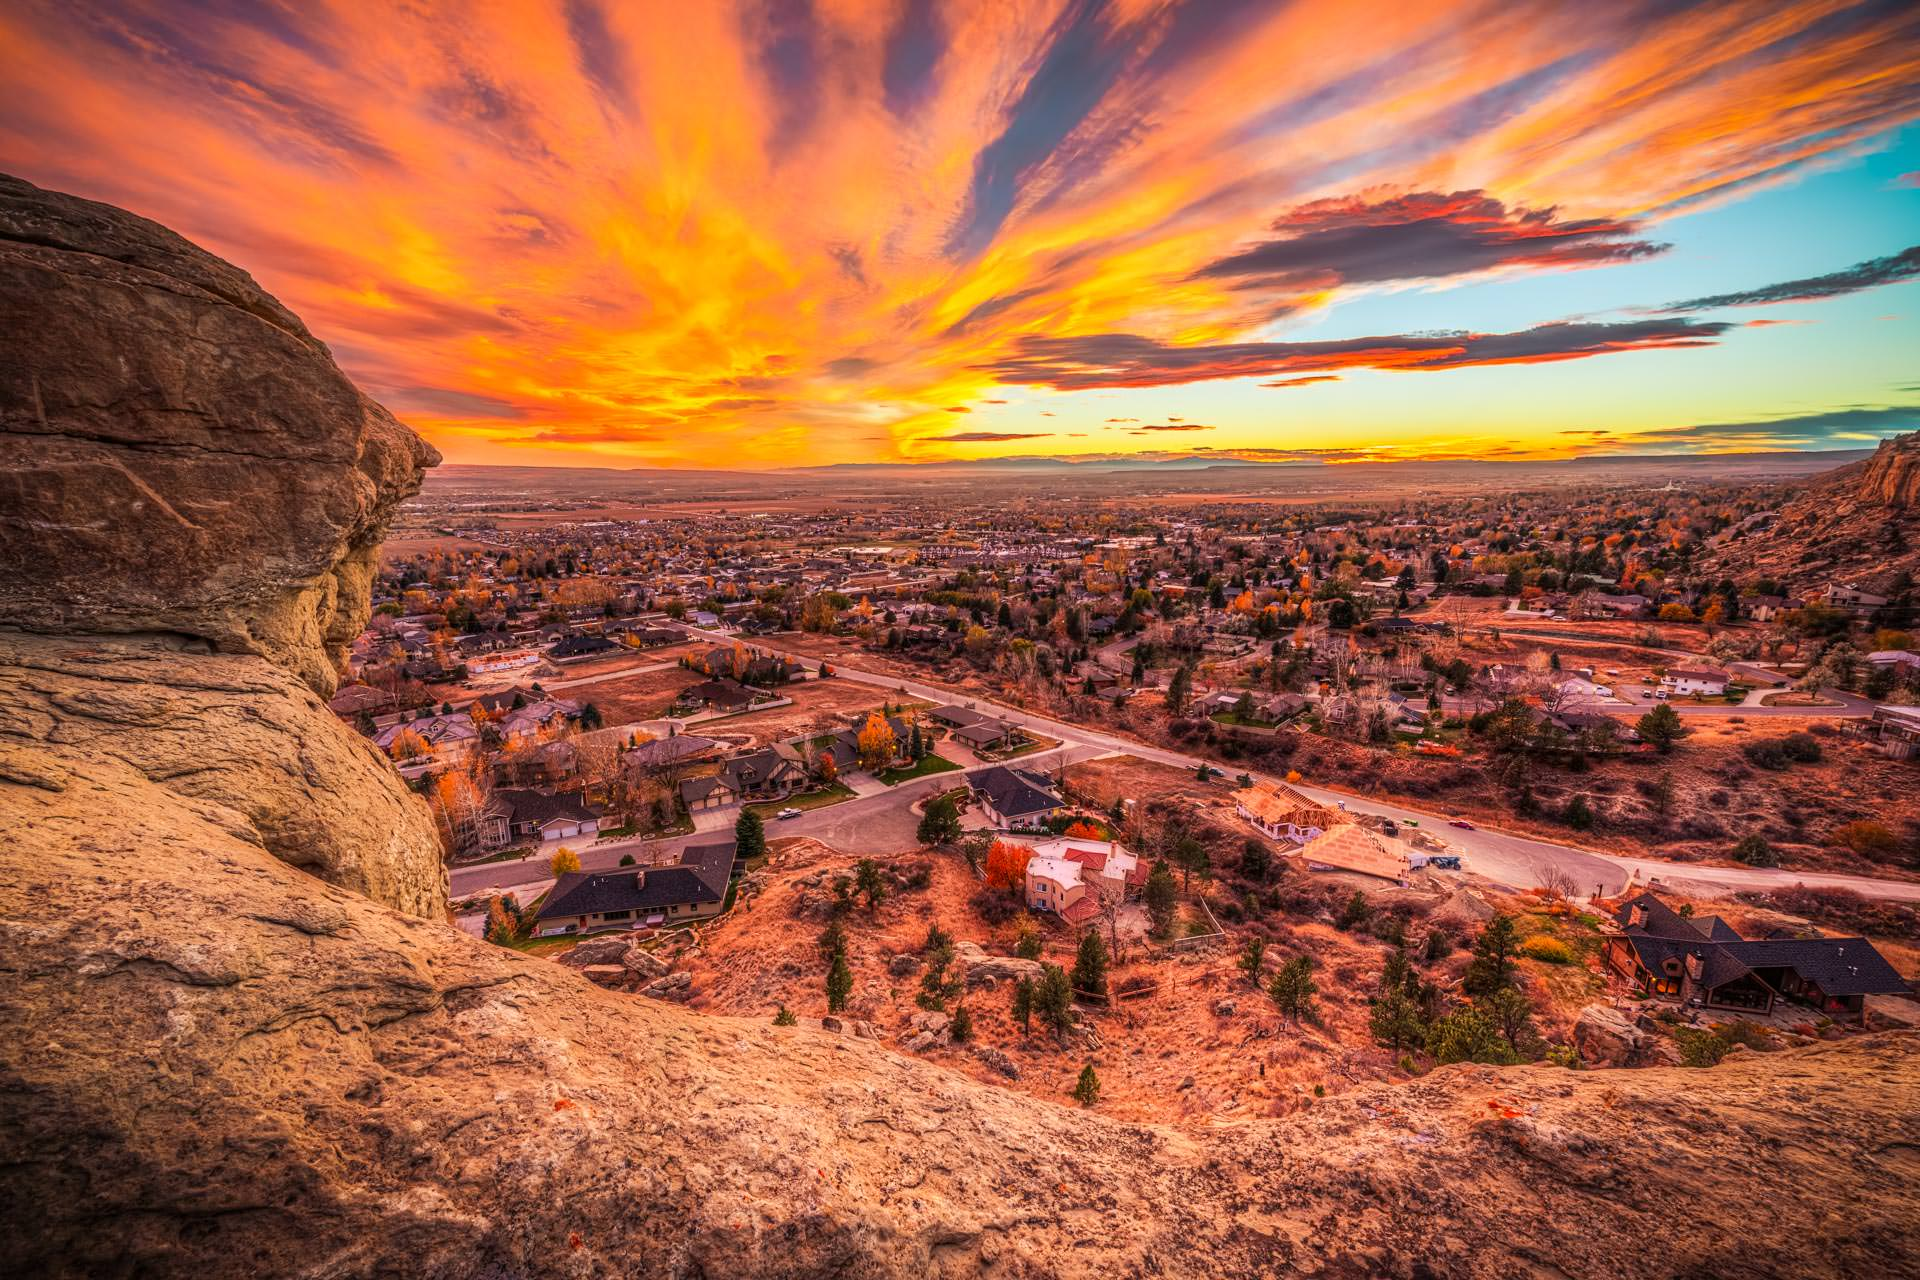 montana places safest cities personal contents finance